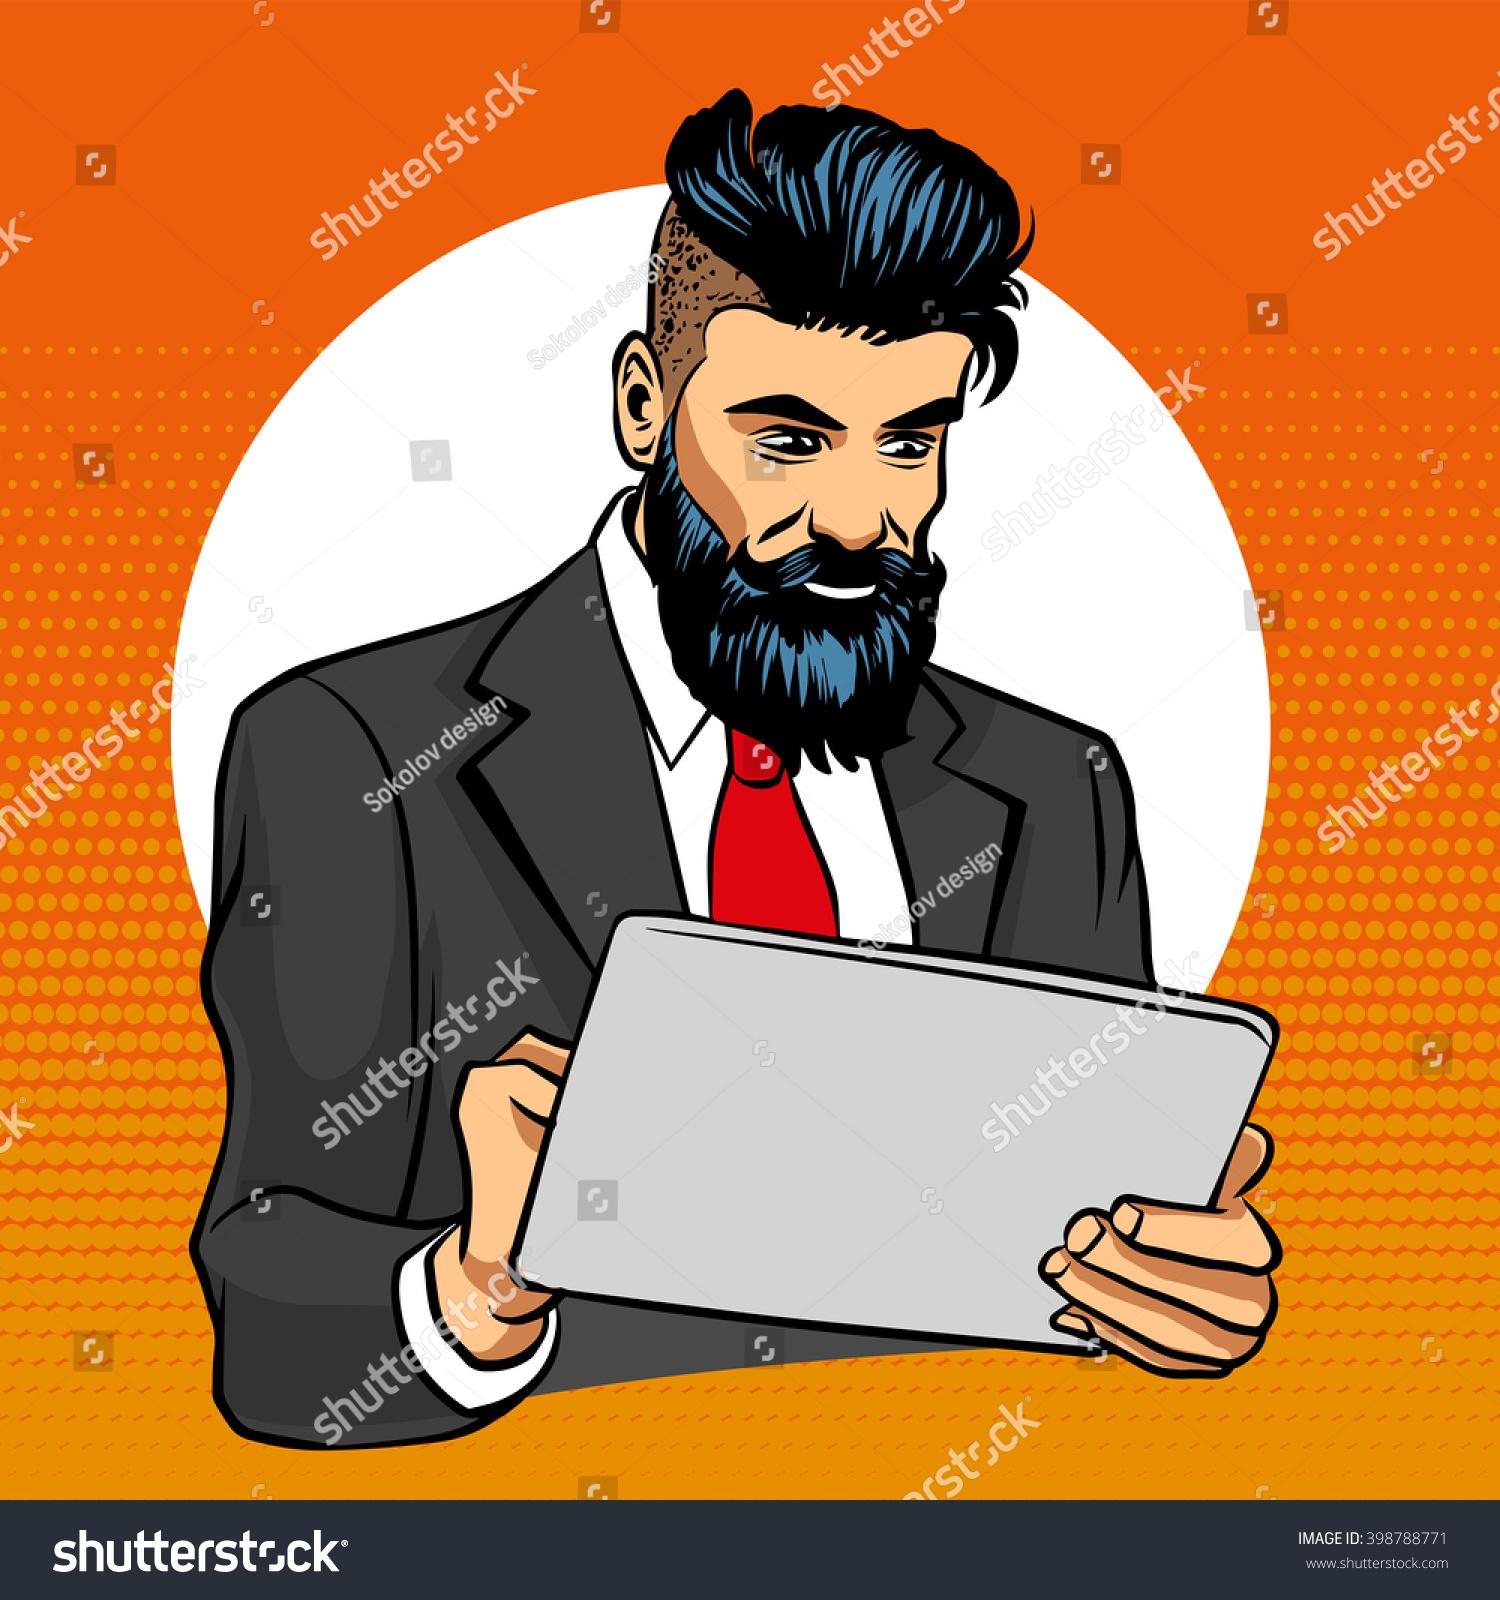 Hipster Beard Mustache Surf Internet On Stock Vector ...